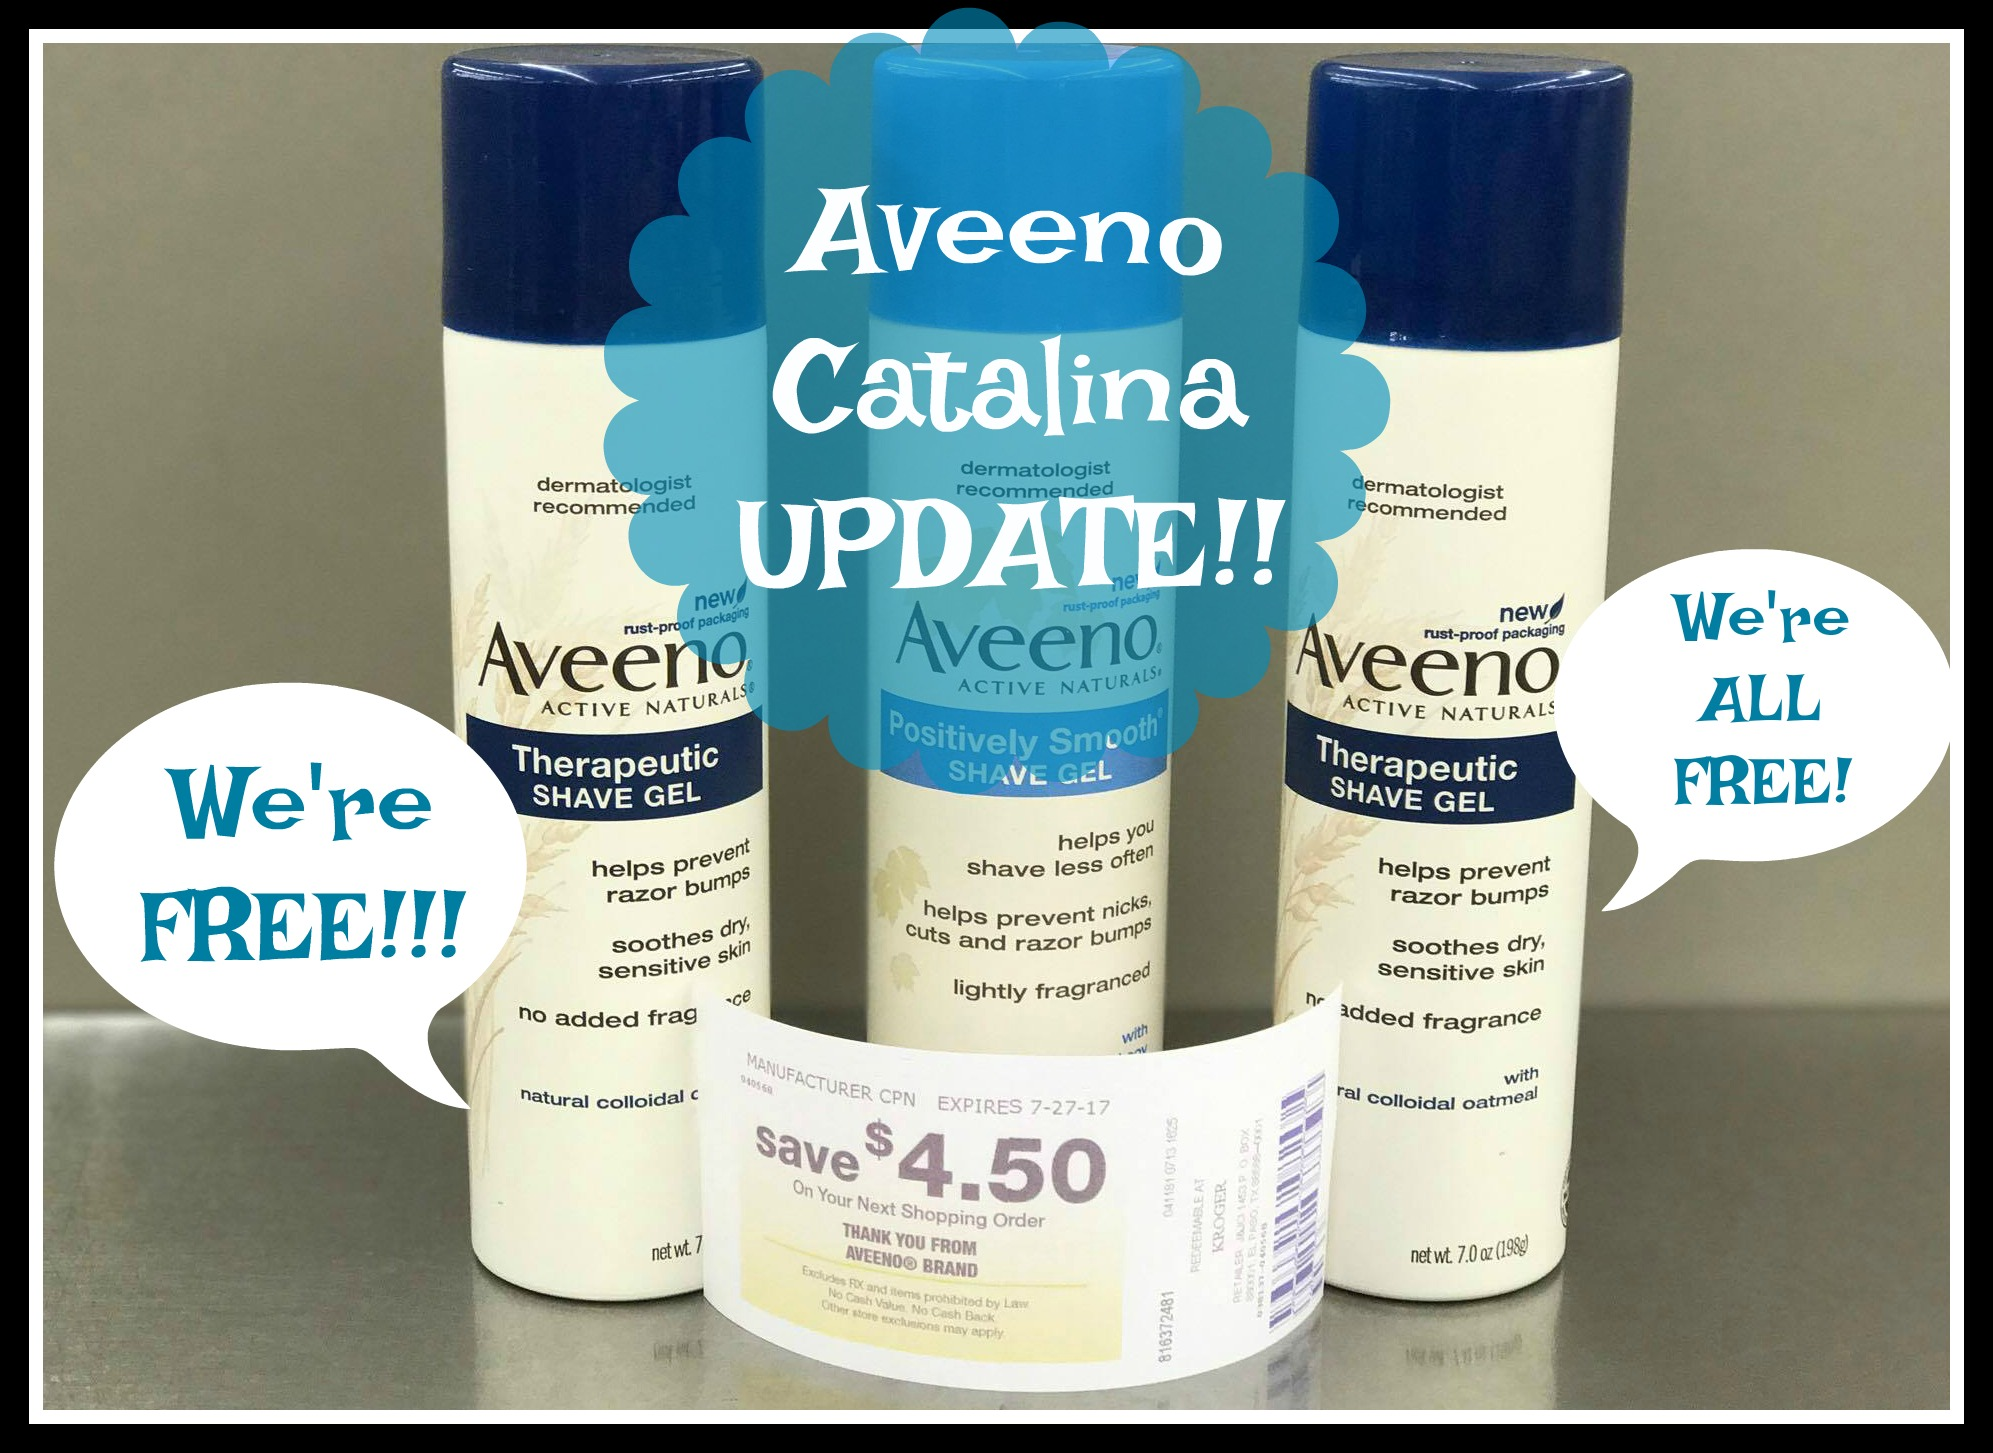 *Aveeno Catalina Update* Get THREE Shave Gels for FREE at Kroger!! - Kroger Krazy